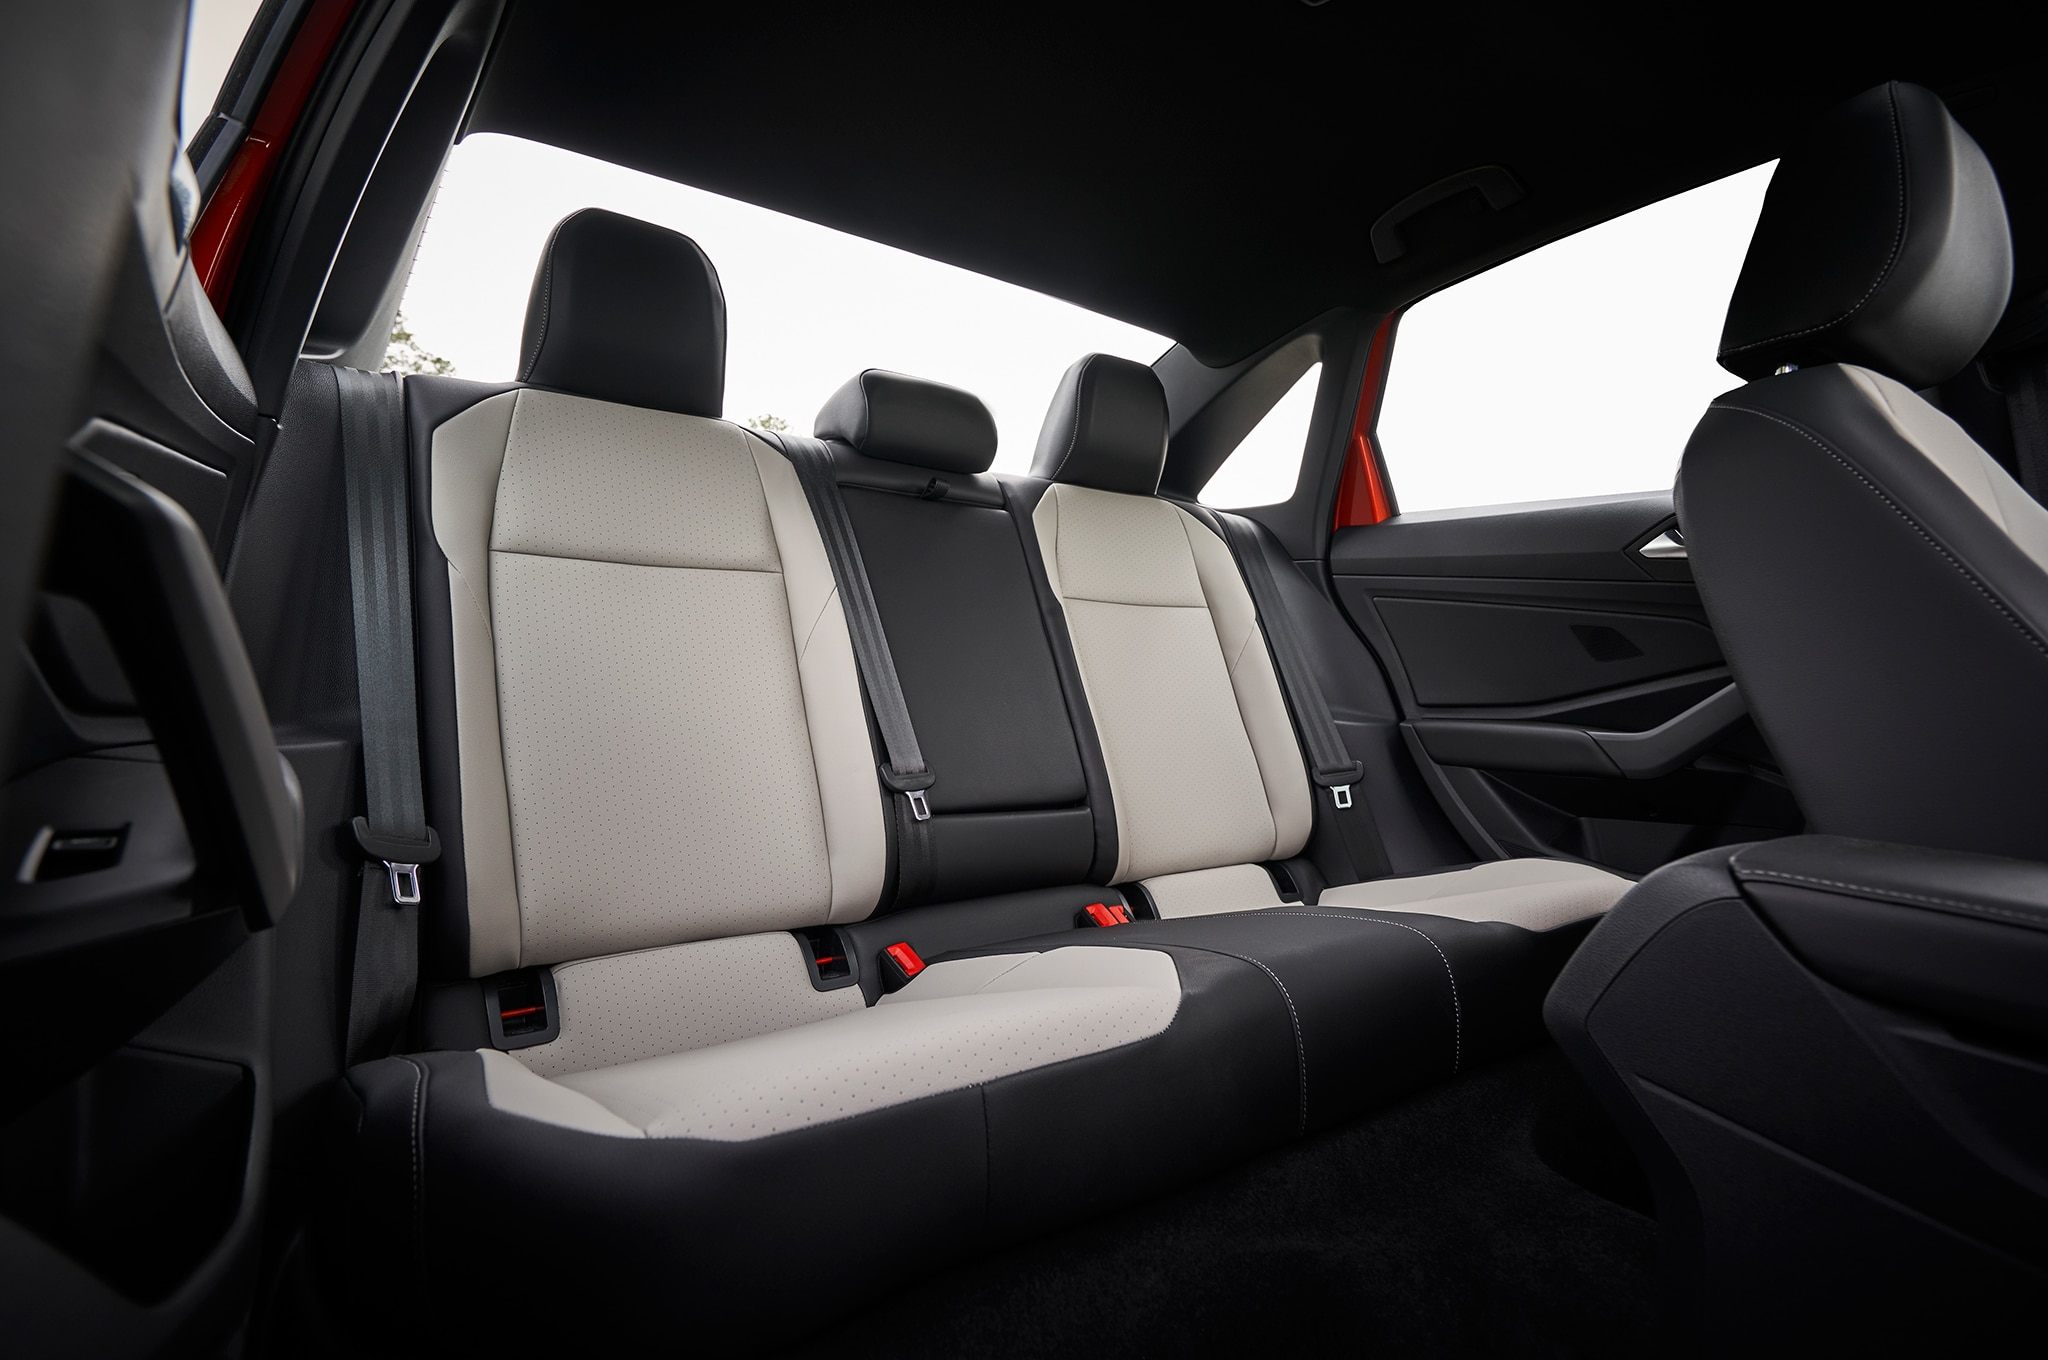 2019 Volkswagen Jetta First Drive Review Automobile Magazine